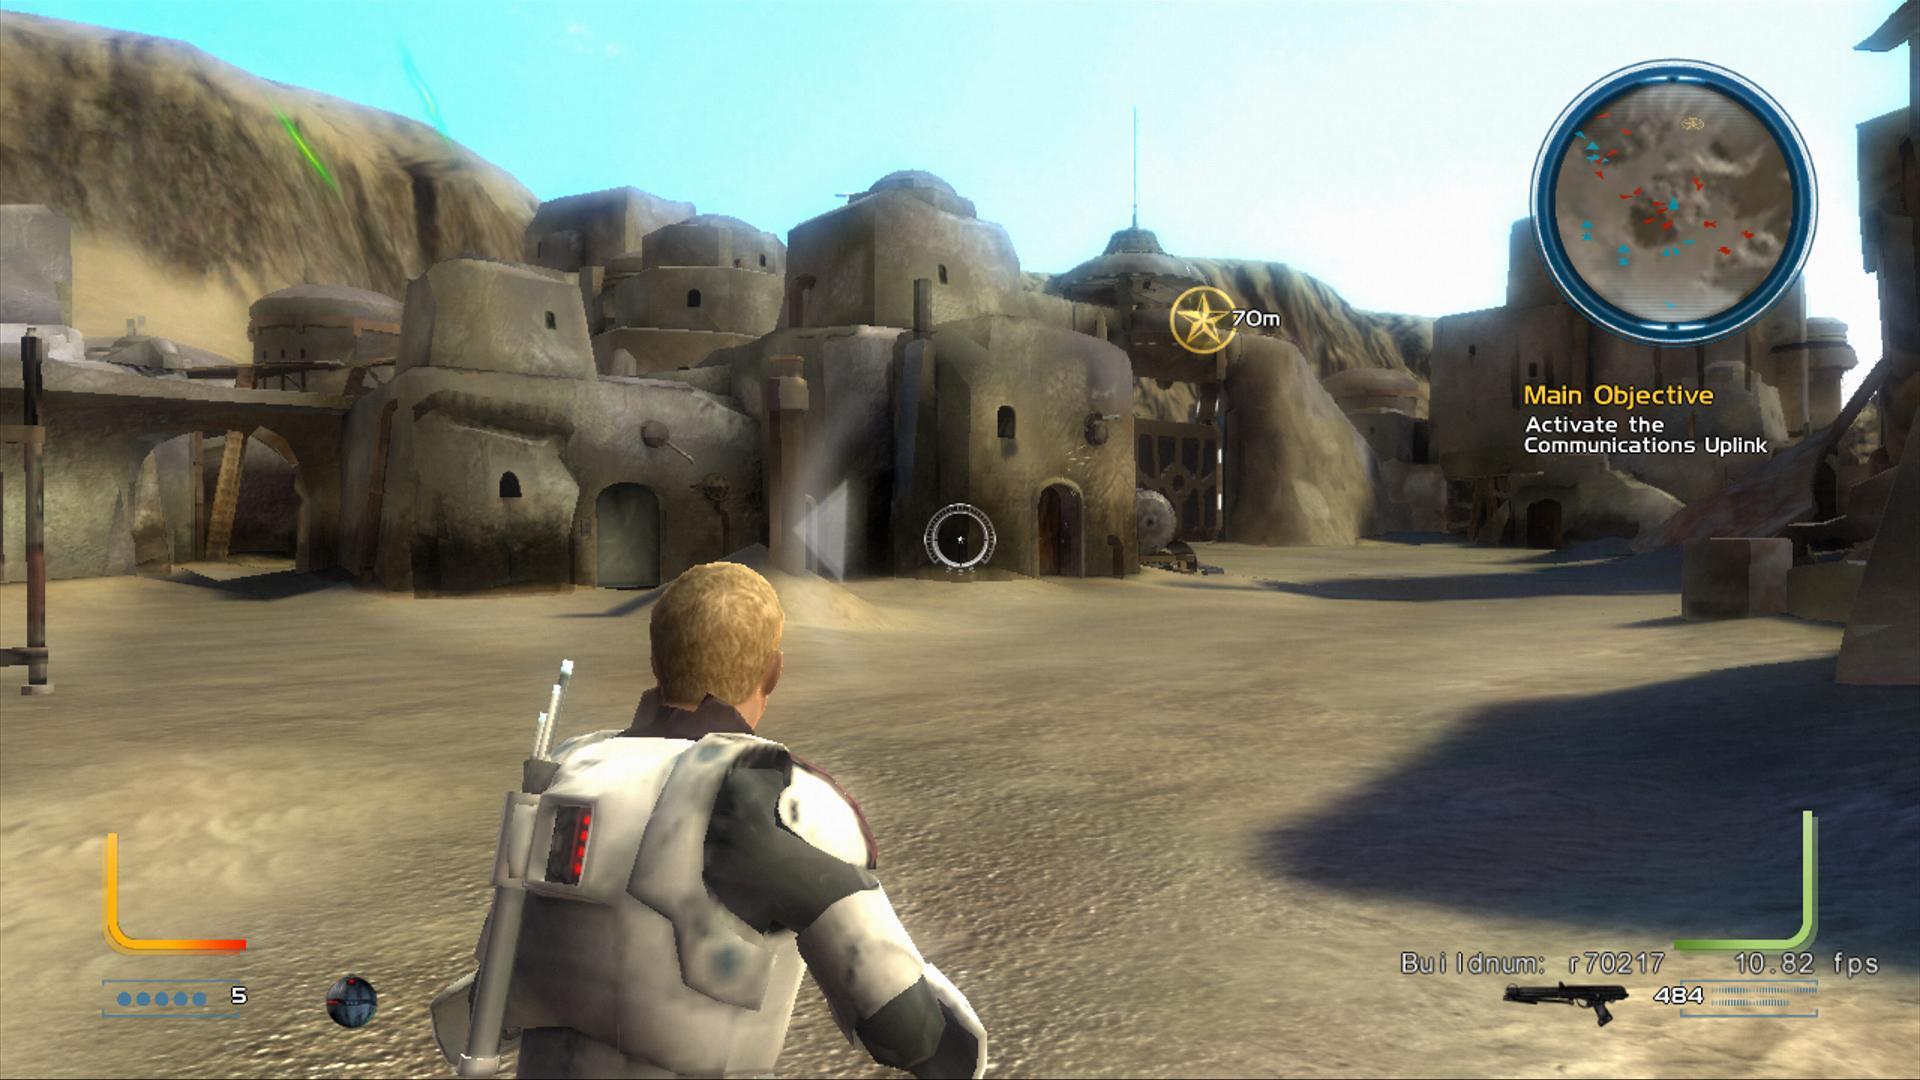 Star Wars Battlefront III (3) Xbox 360 Build 70217 Leaked